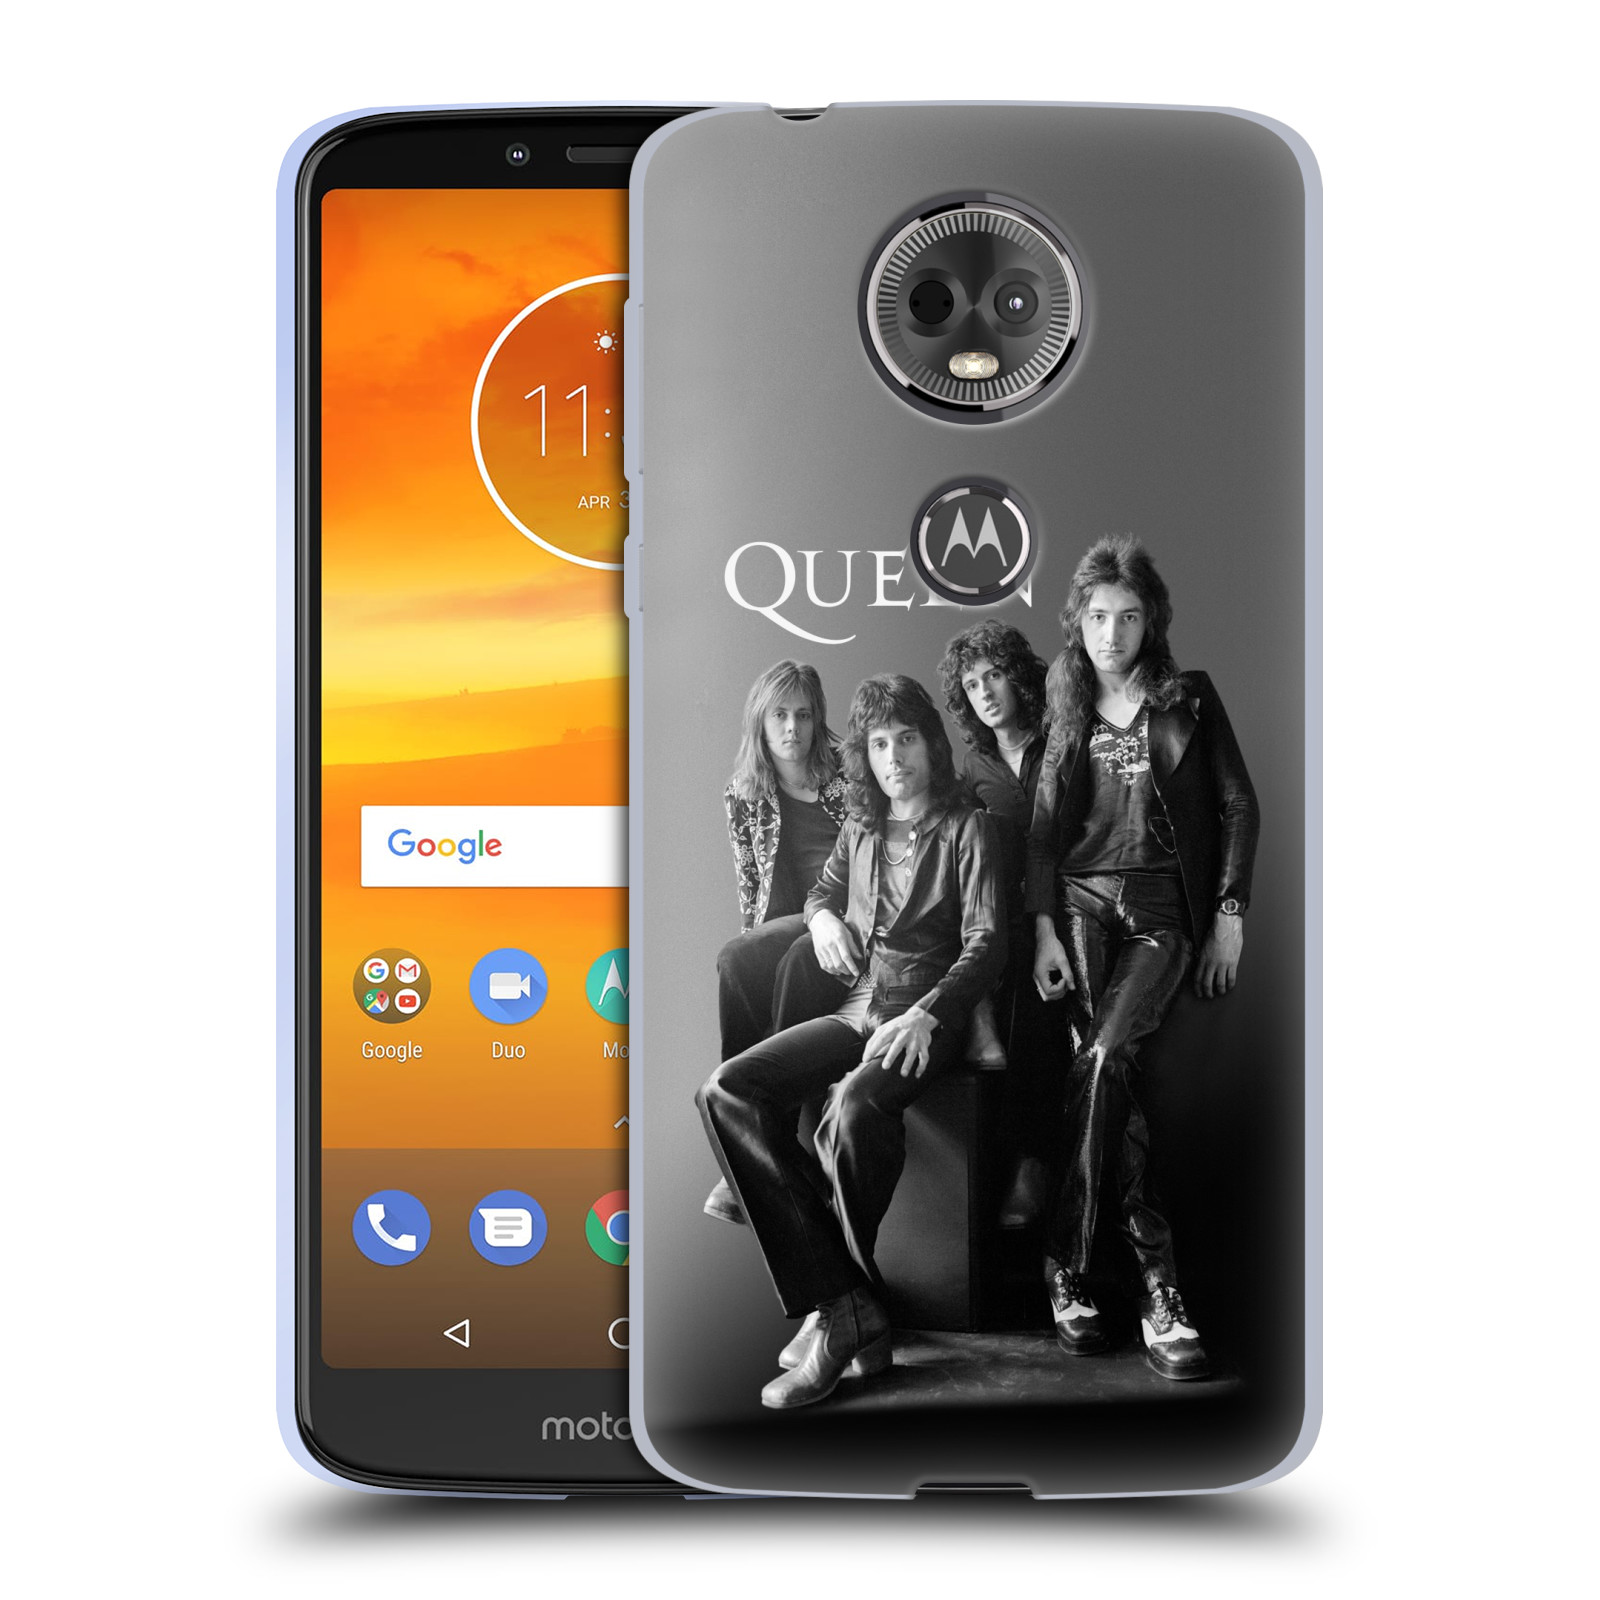 Silikonové pouzdro na mobil Motorola Moto E5 Plus - Head Case - Queen - Skupina